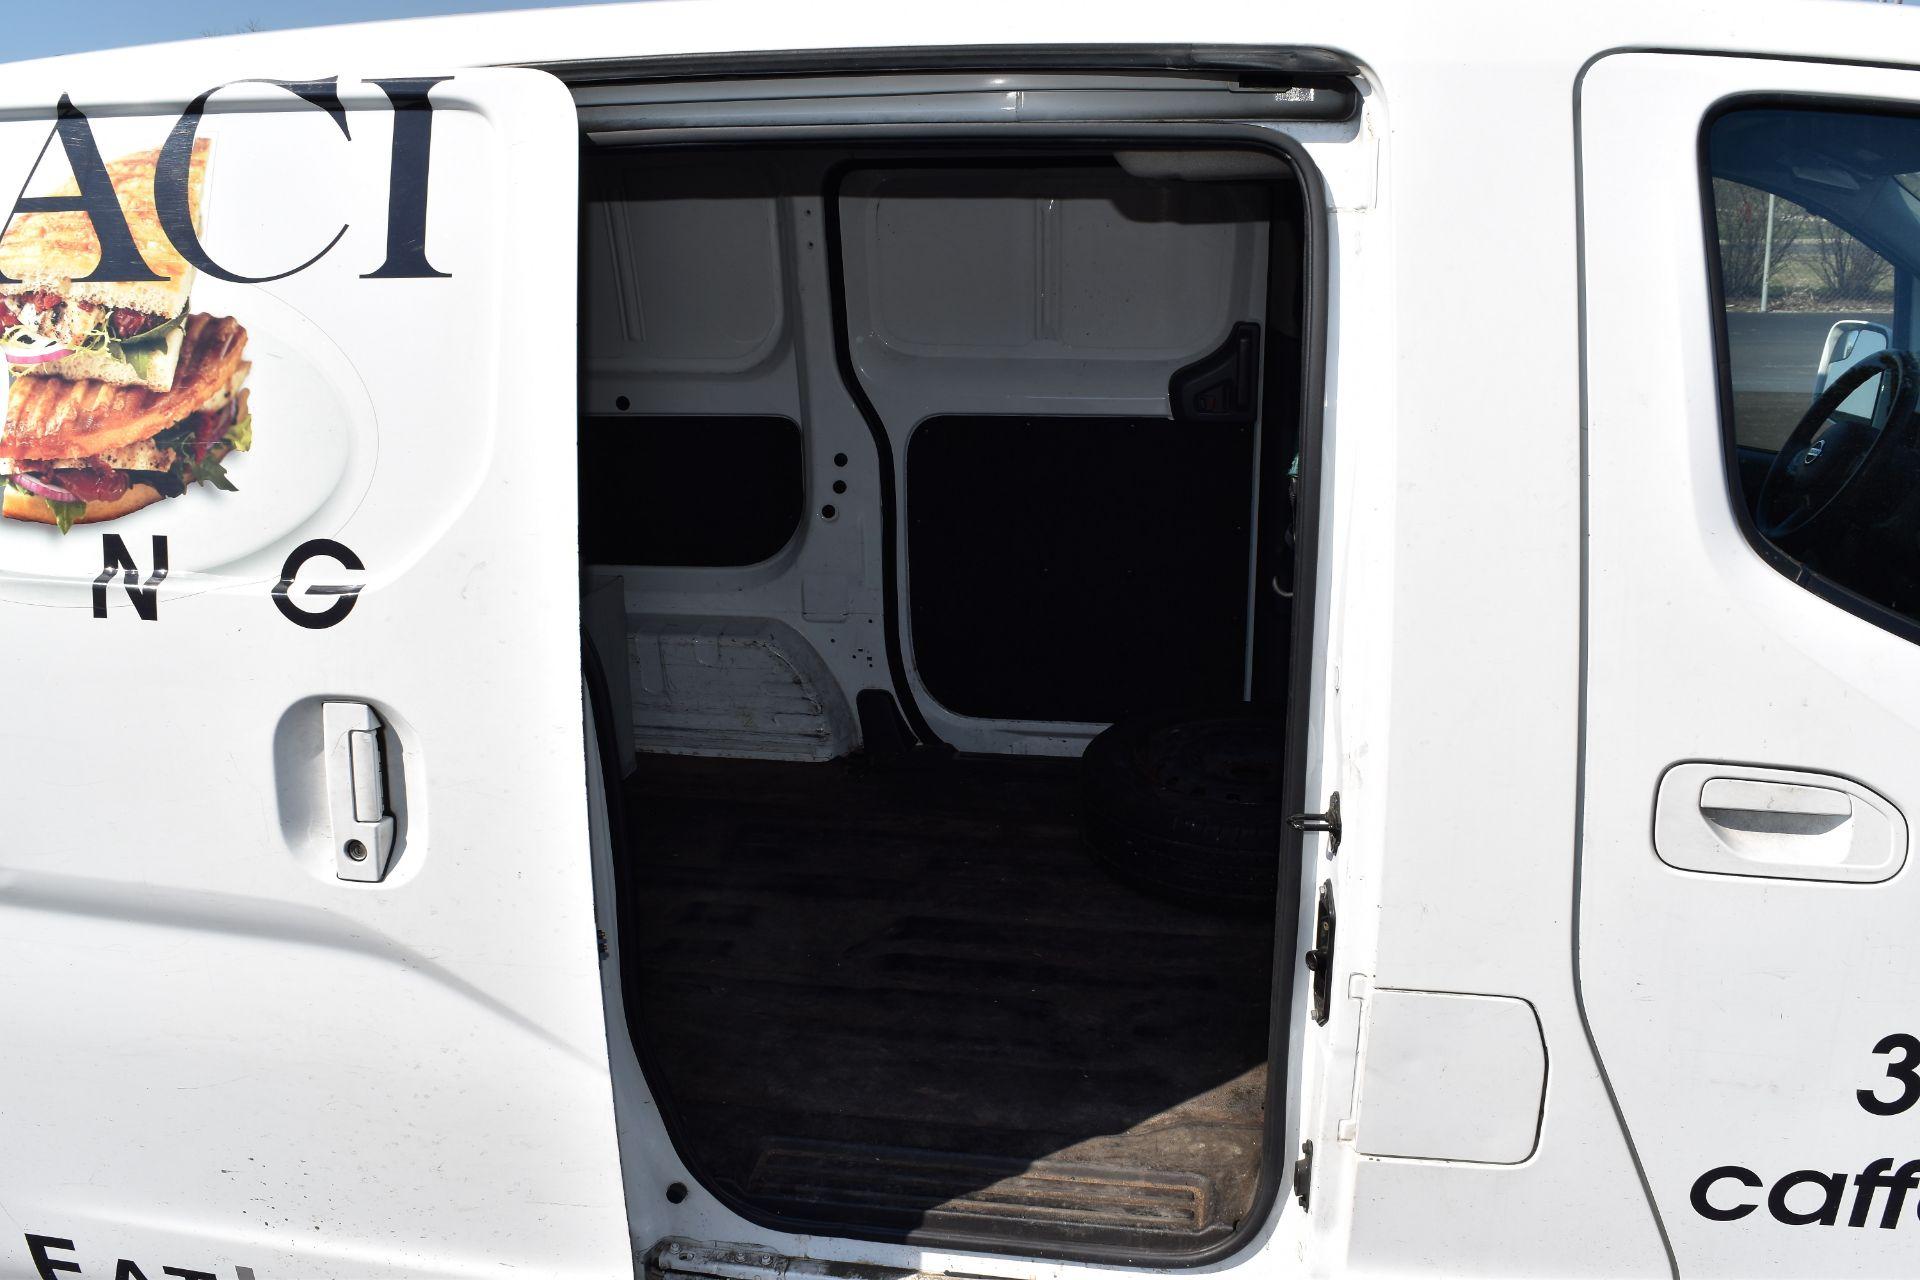 2013 Nissan NV200 Delivery Van - Image 38 of 54